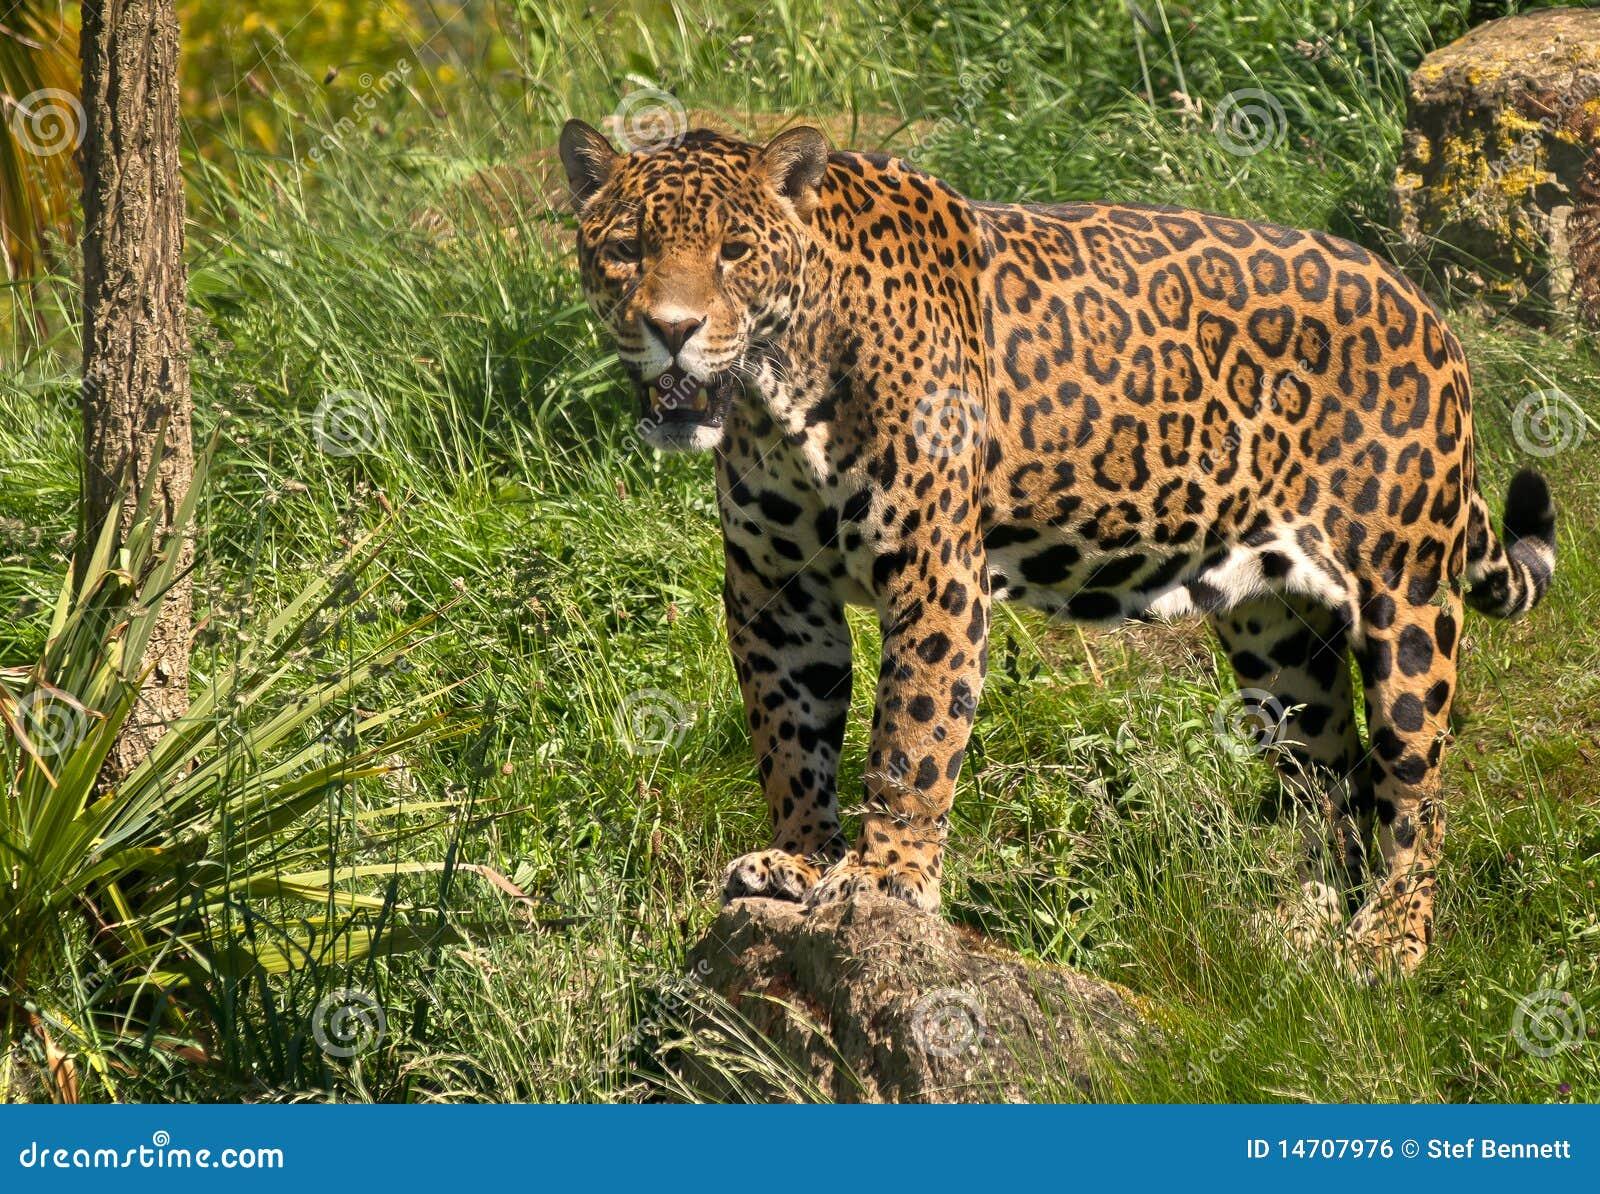 jaguar standing - photo #10